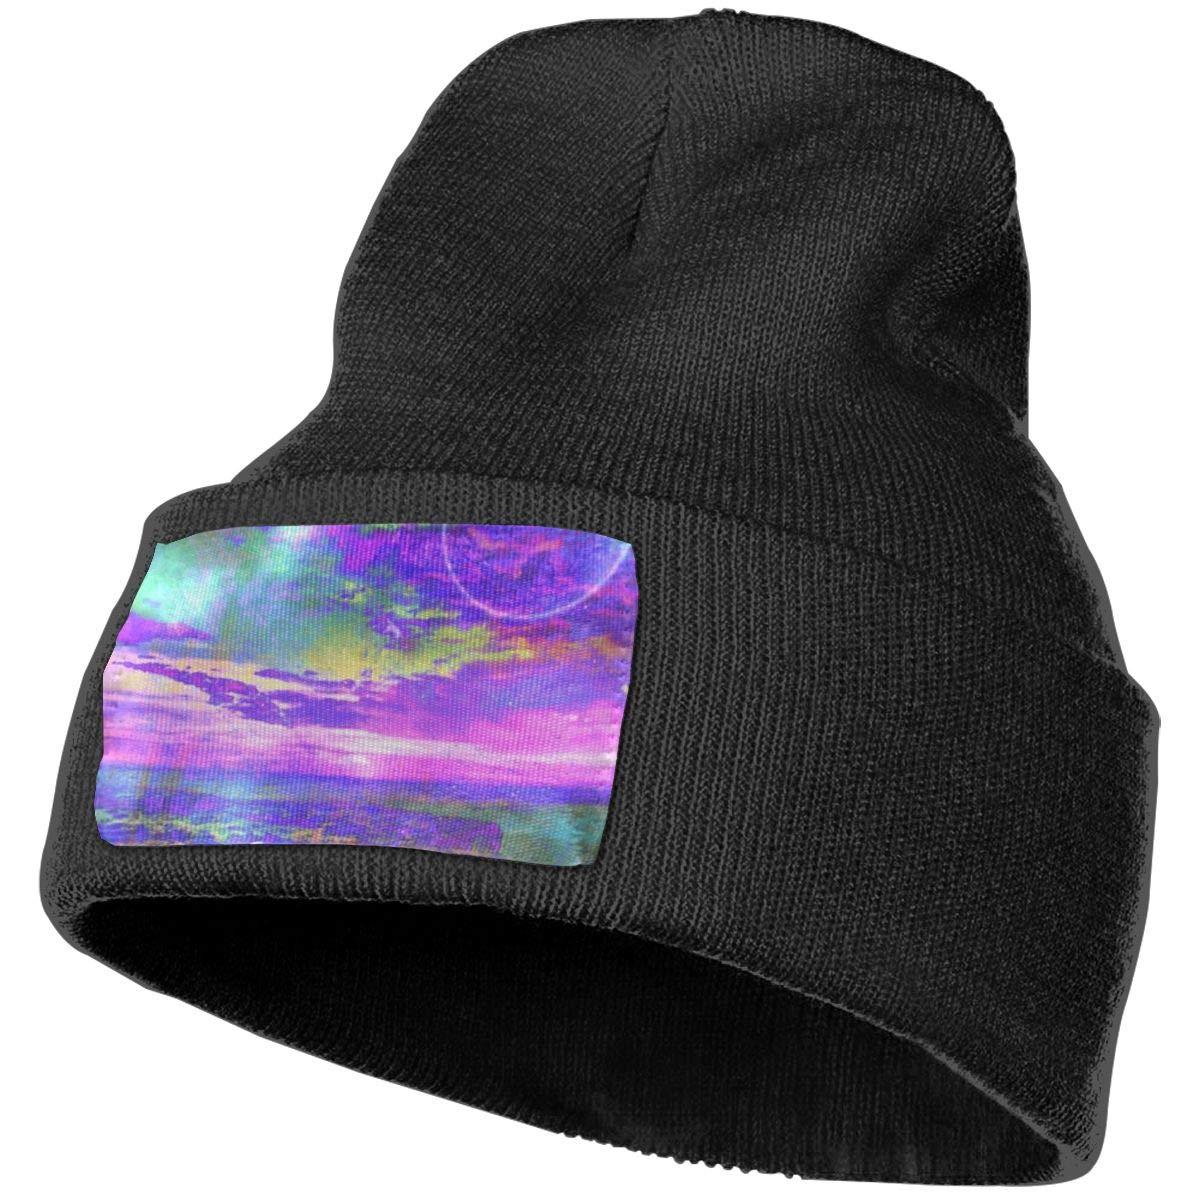 100/% Acrylic Acid Mas Beanie Hat Ruin Planet Fashion Knitting Hat for Men Women